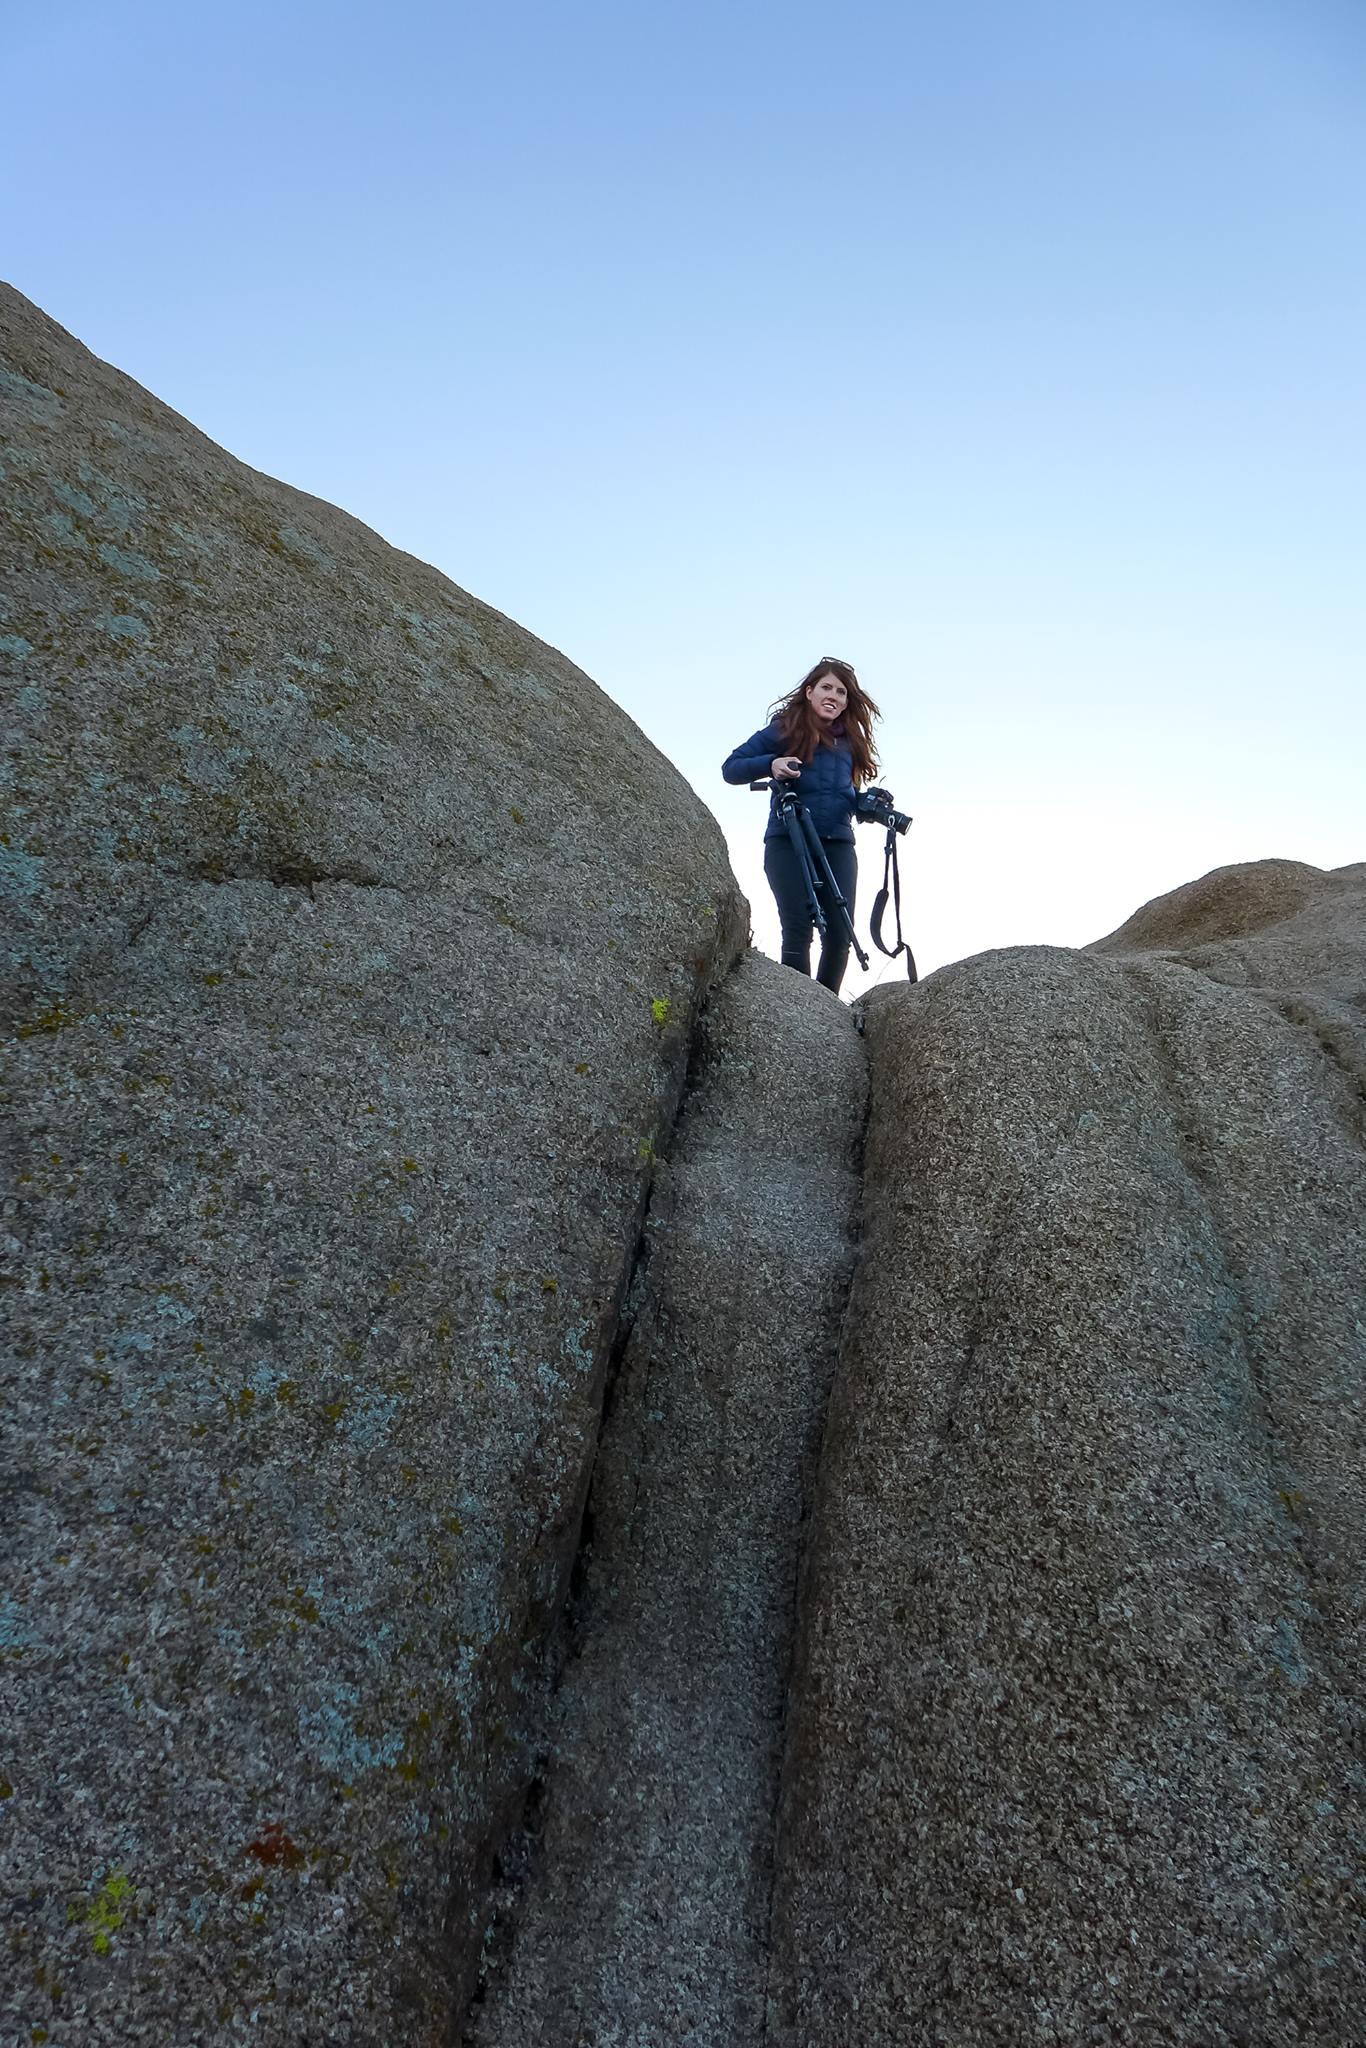 yakima-racks-maggie-kirkland-national-park-photoshoot-joshua-tree-climbing.jpg